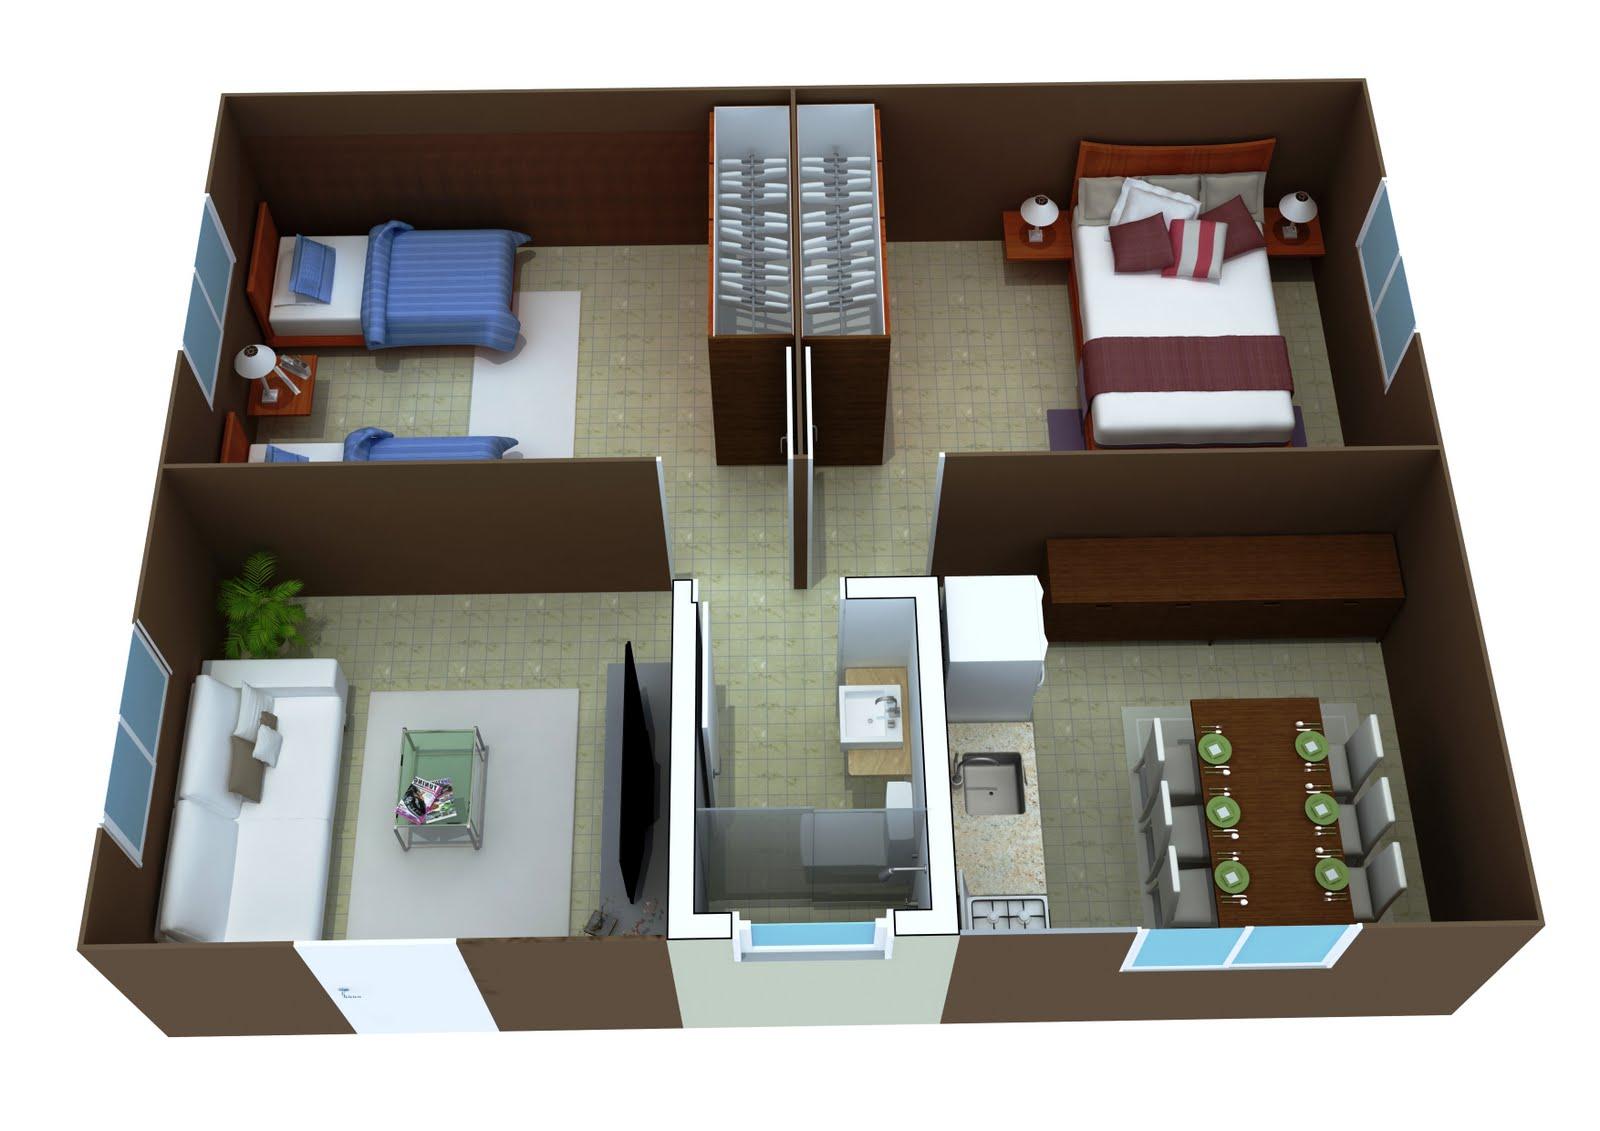 Como construir sua casa fotos de plantas de casas - Plantas para casa ...